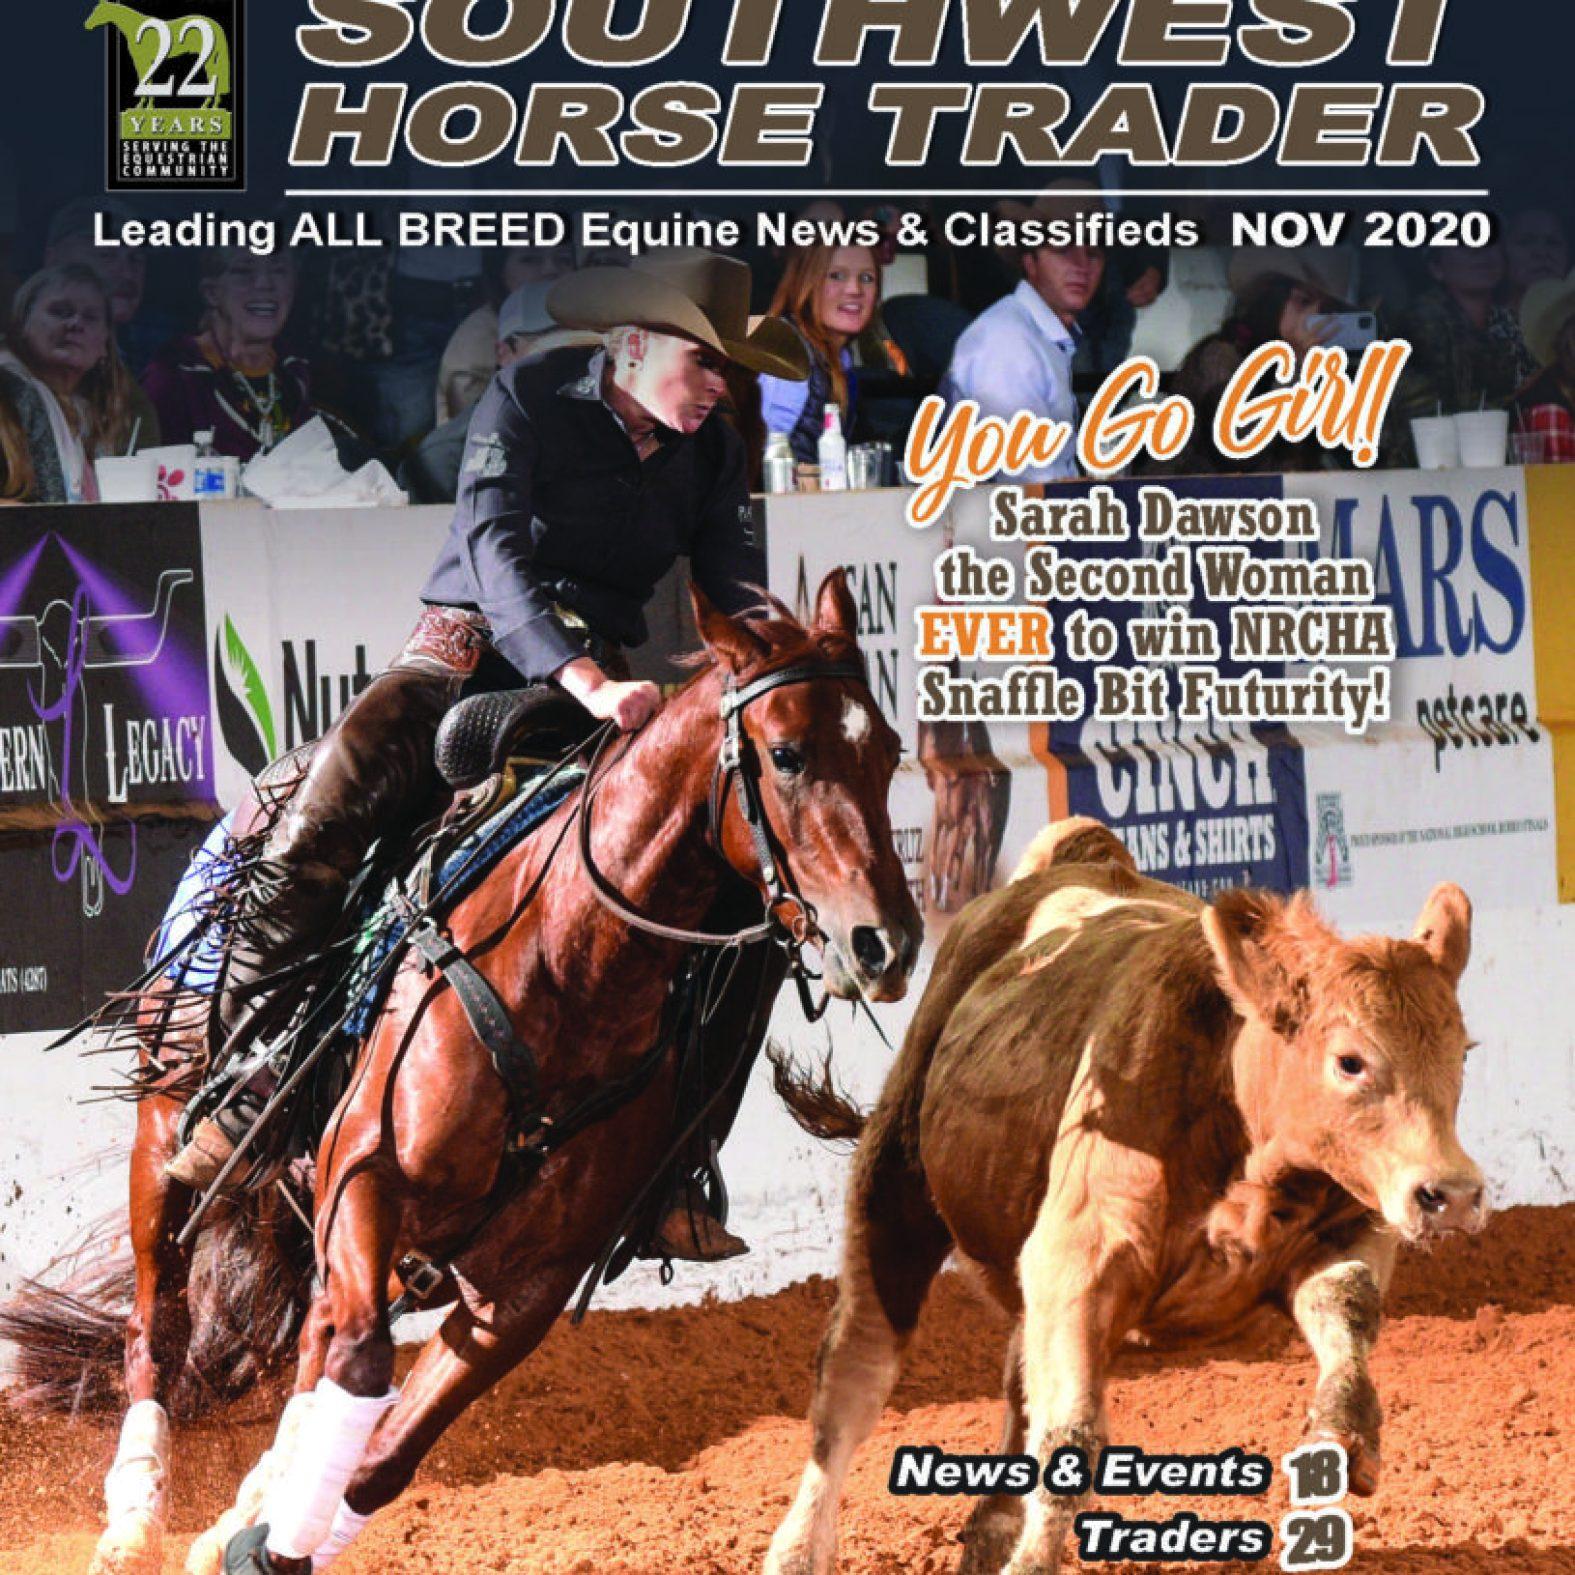 SouthWest Horse Trader November 2020 Issue